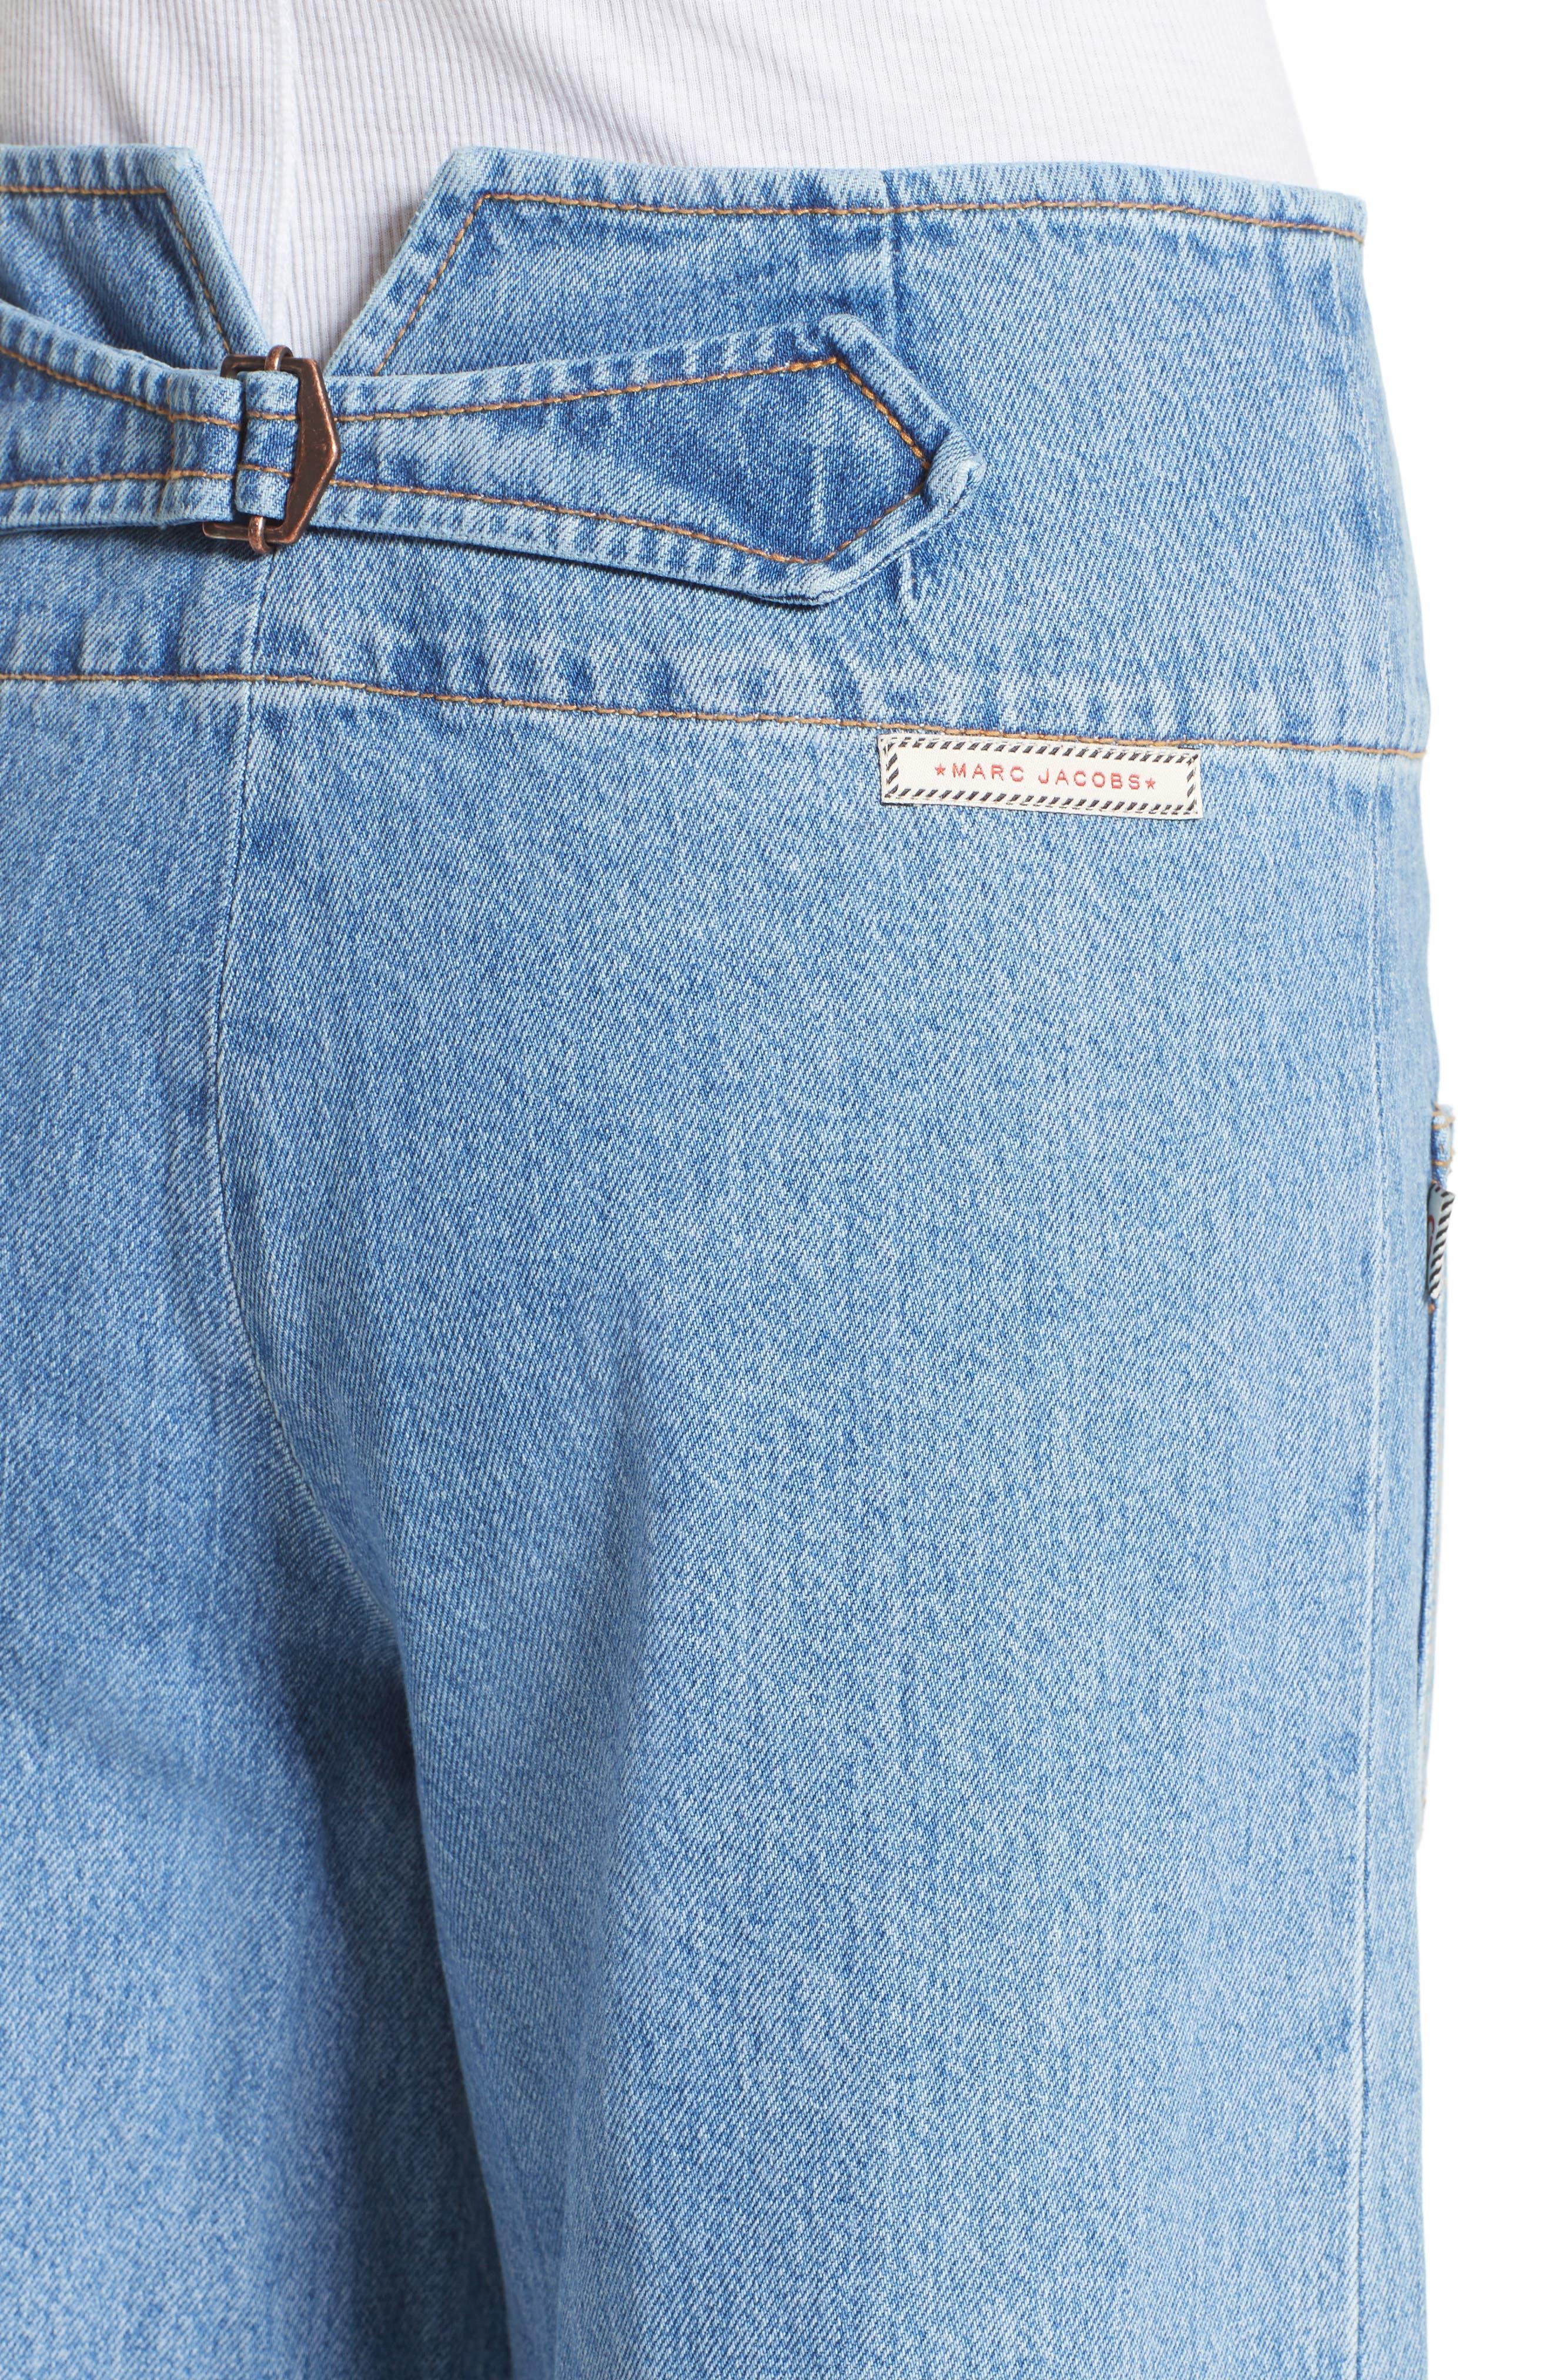 High Waist Crop Flare Jeans,                             Alternate thumbnail 7, color,                             Retro Indigo